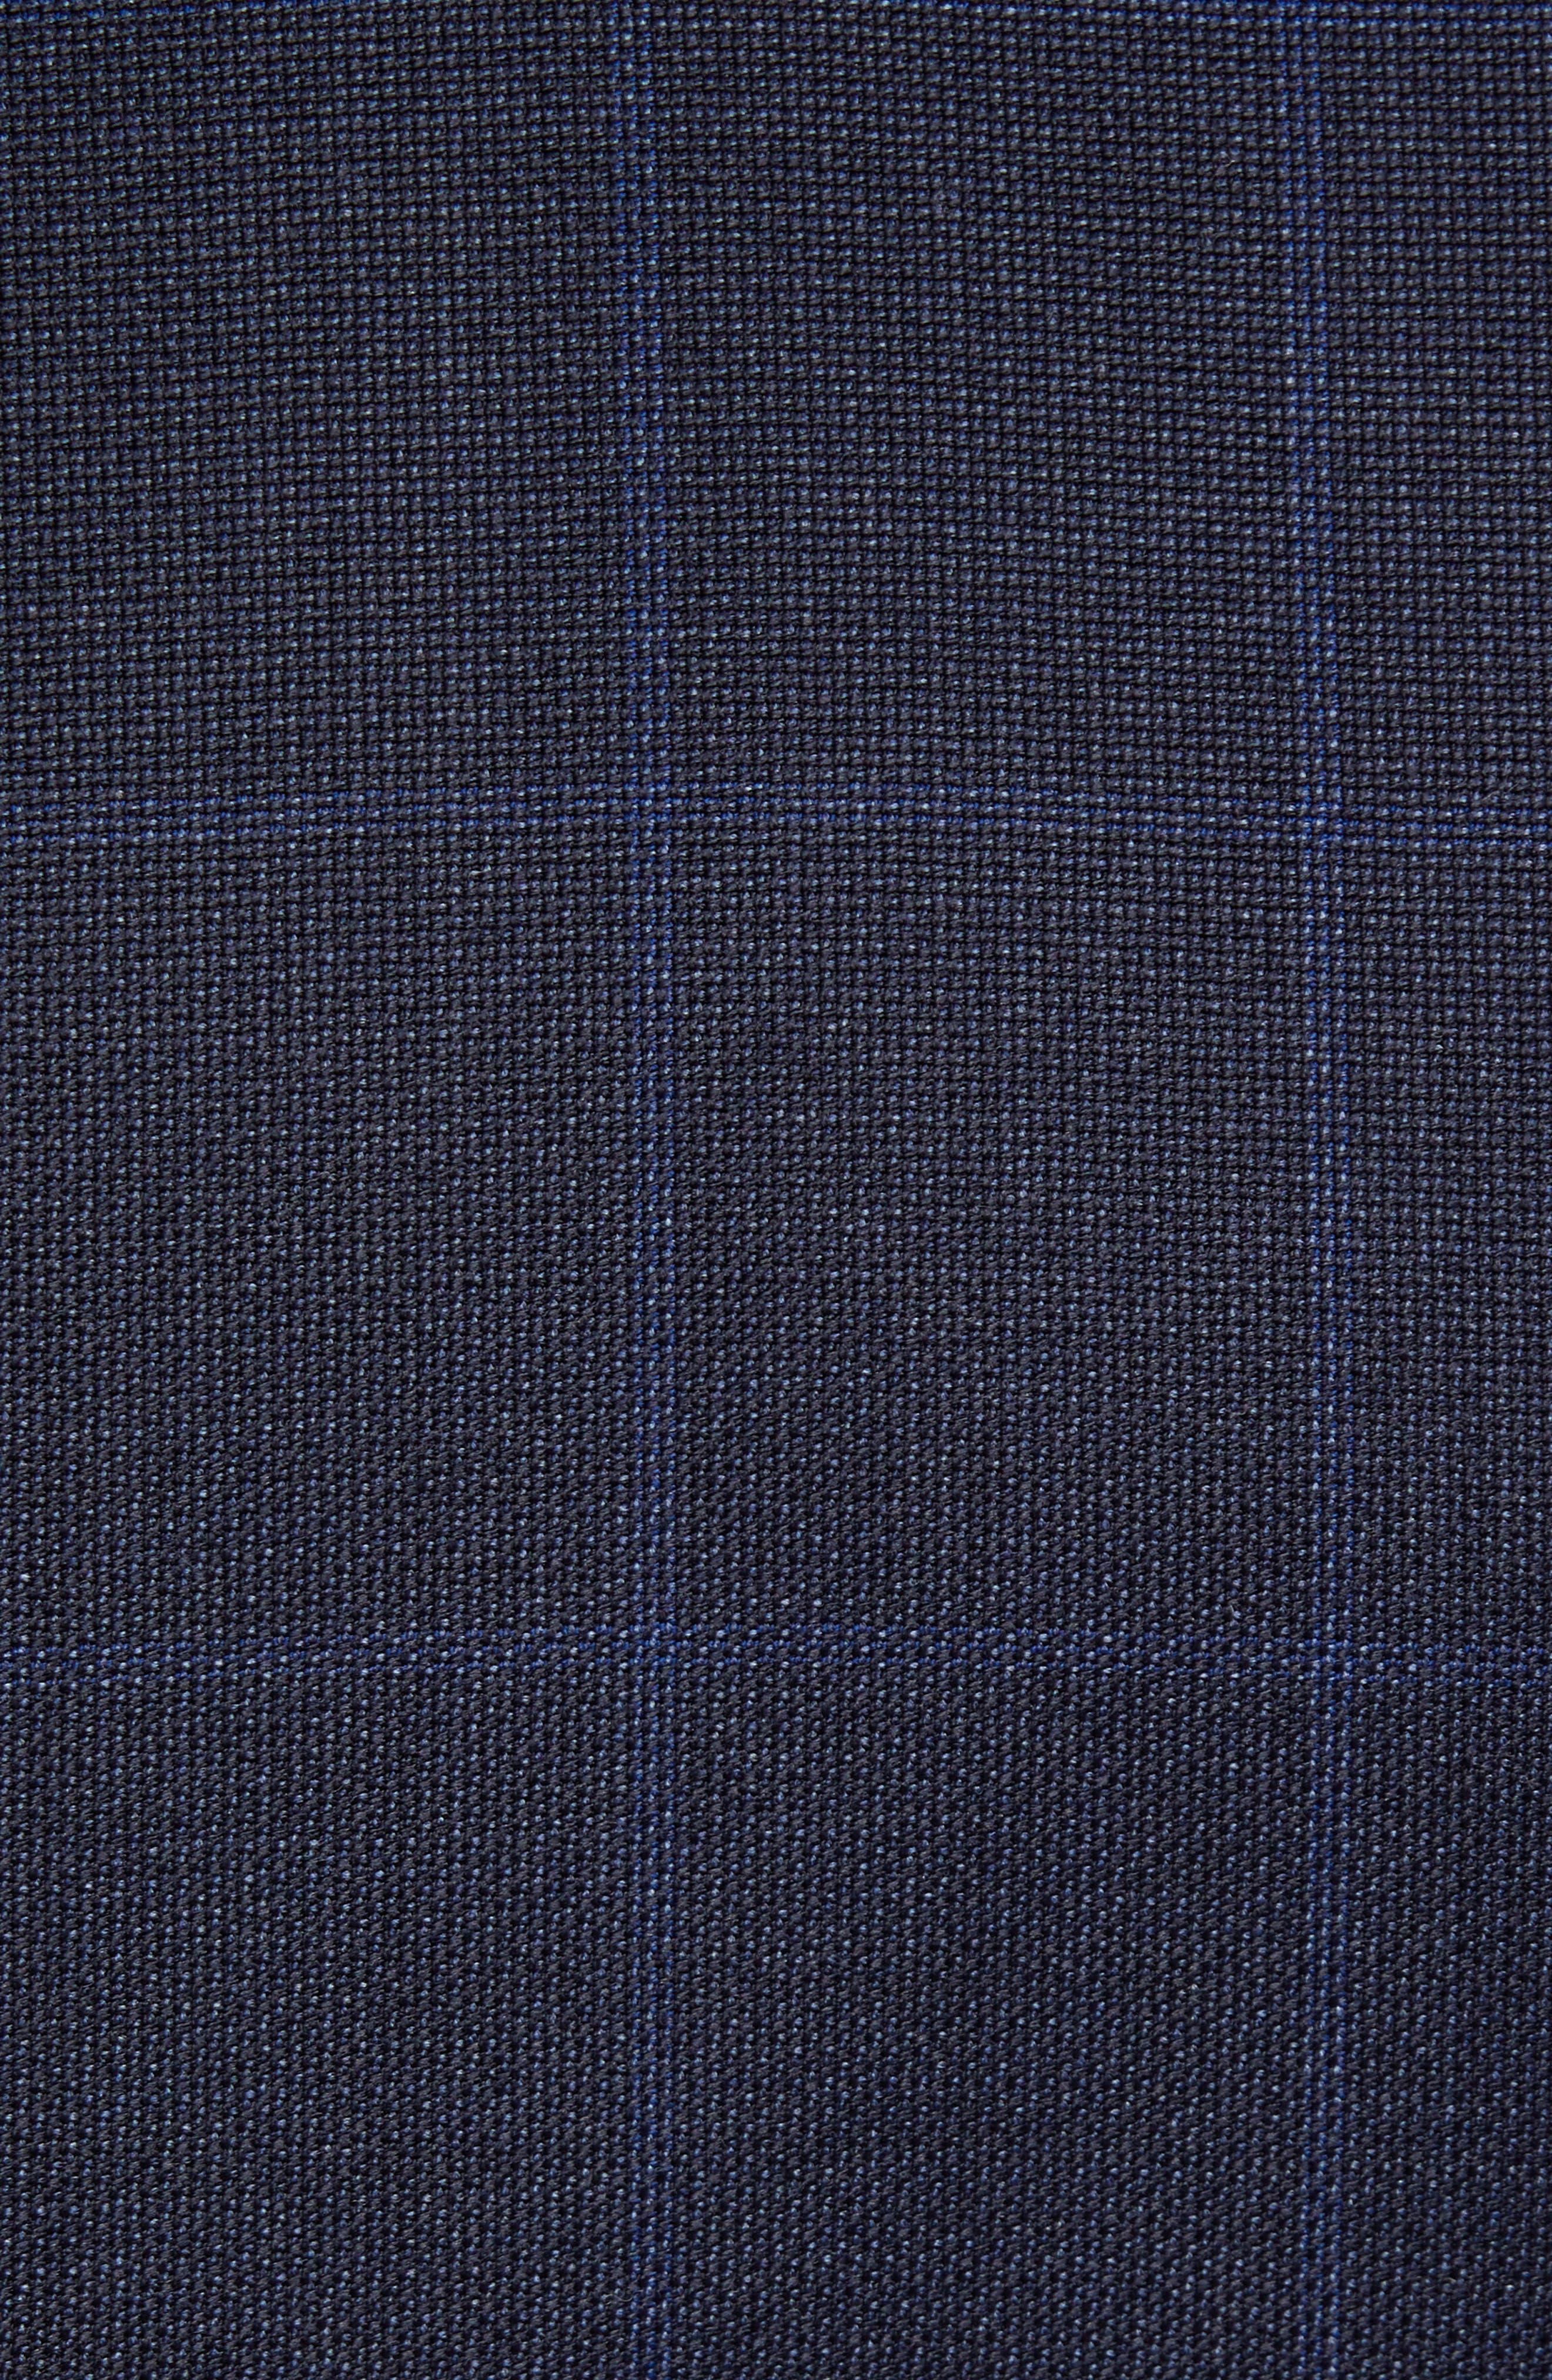 Huge/Genius Trim Fit Windowpane Wool Three-Piece Suit,                             Alternate thumbnail 8, color,                             480